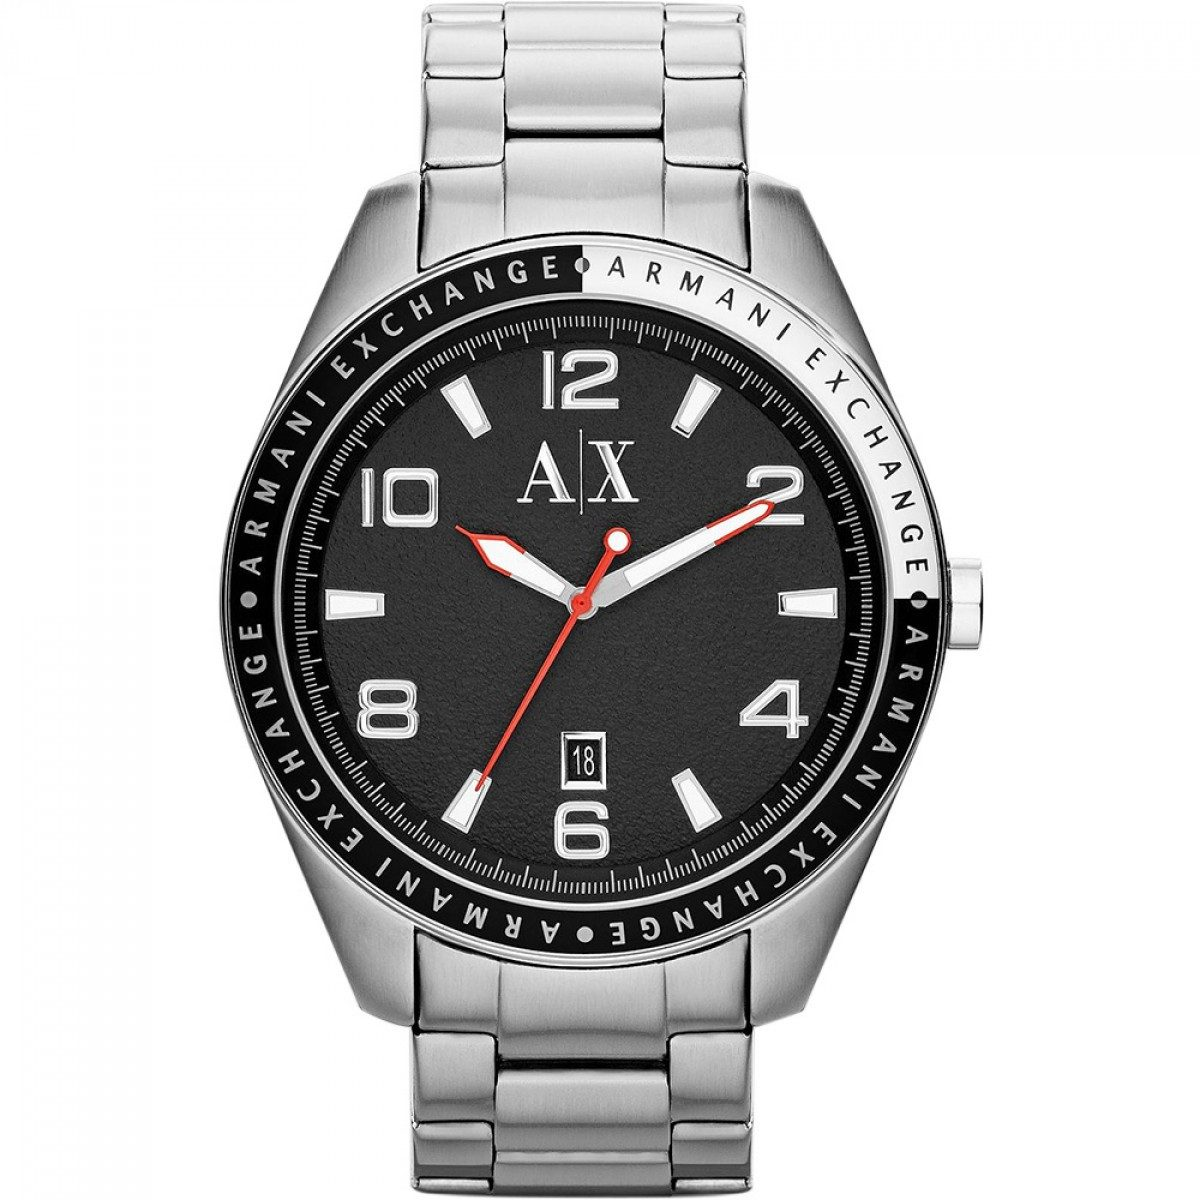 07bdb2fb13d relógio armani exchange ax1303 maculino pulseira aço garanti. Carregando  zoom.